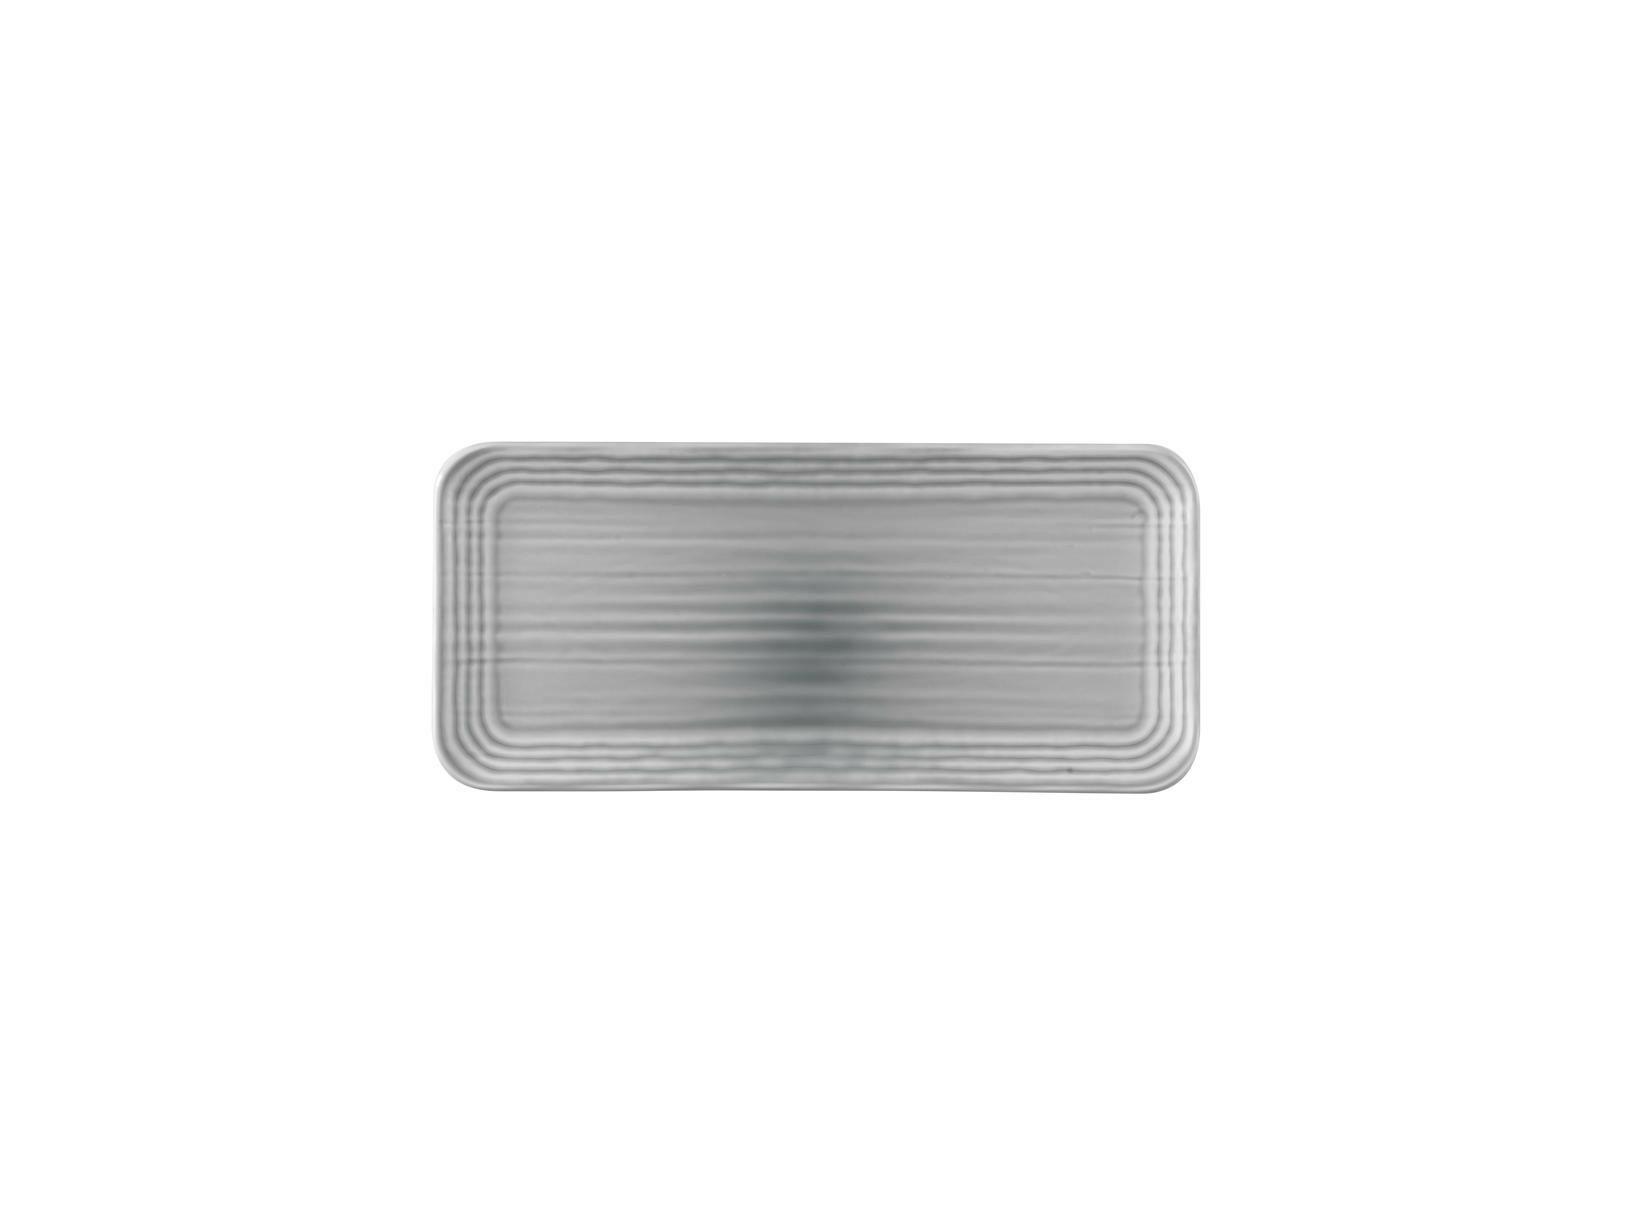 Dudson Harvest Norse Grey organic rectangular plate 34,6 x 15,6 cm